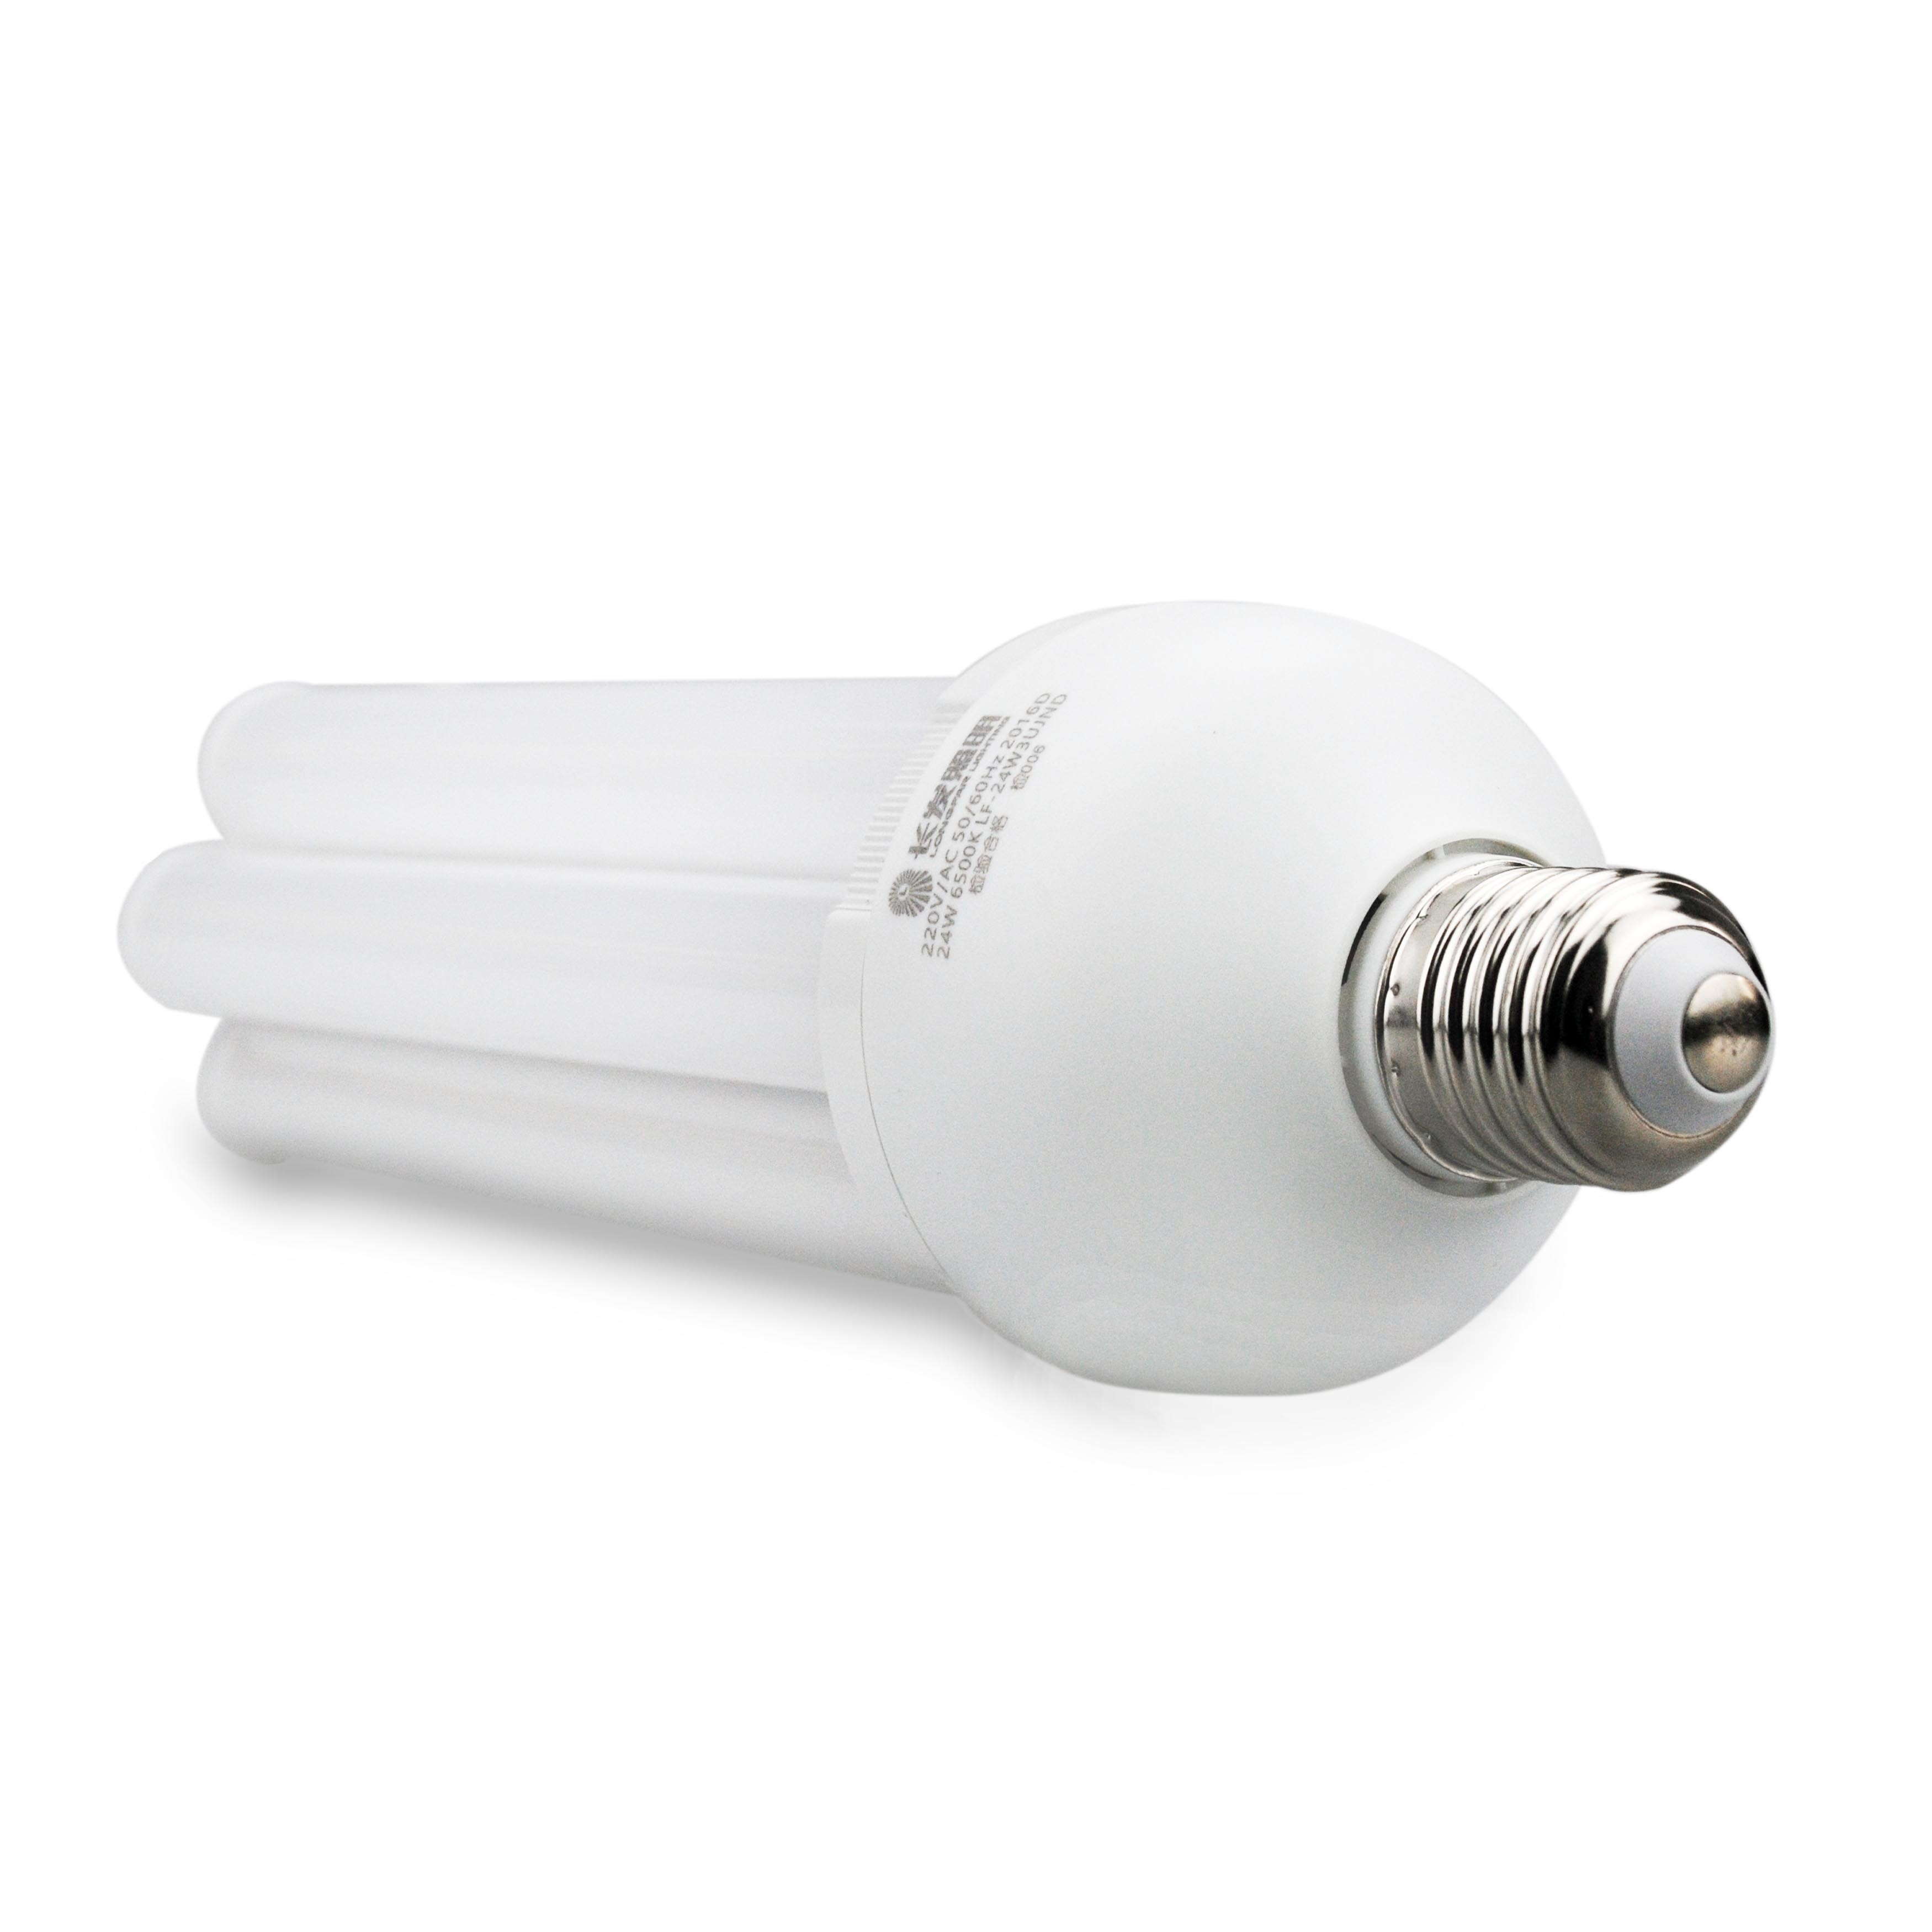 24W PBT Flame Retardant LED Corn Lights